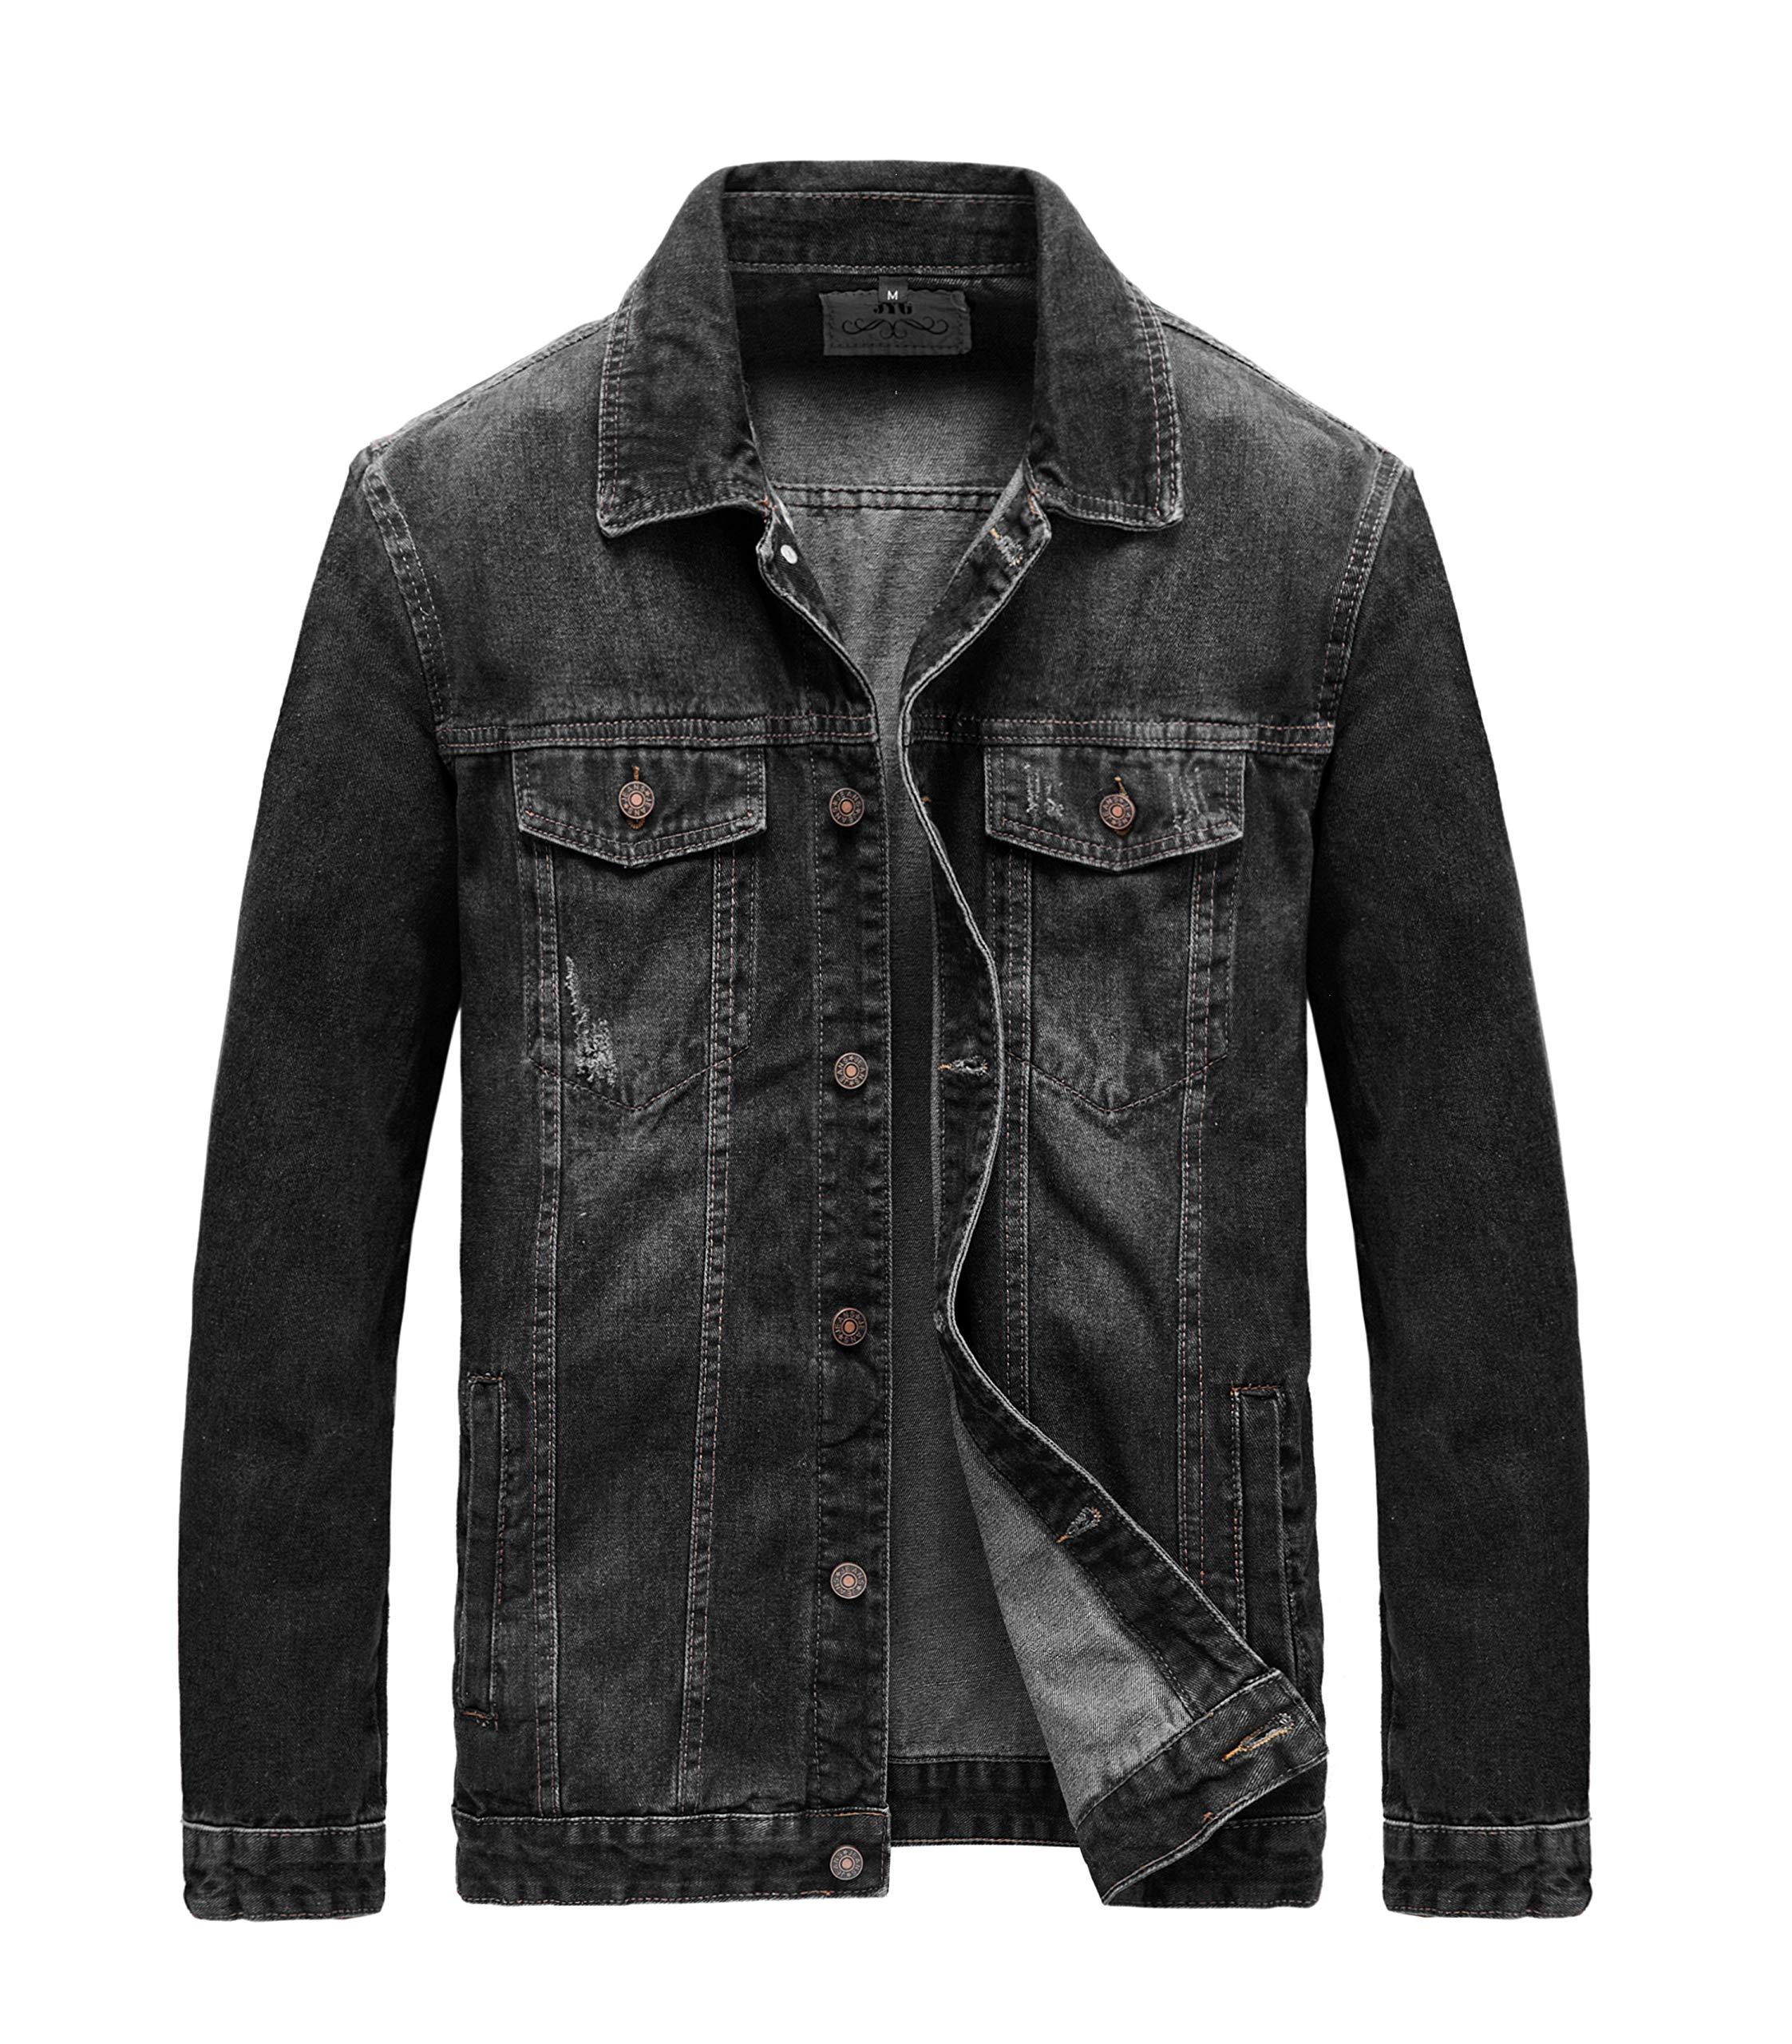 JYG Men's Casual Button Down Denim Jacket Classic Trucker Jean Coat (Black-7536, Large) by JYG